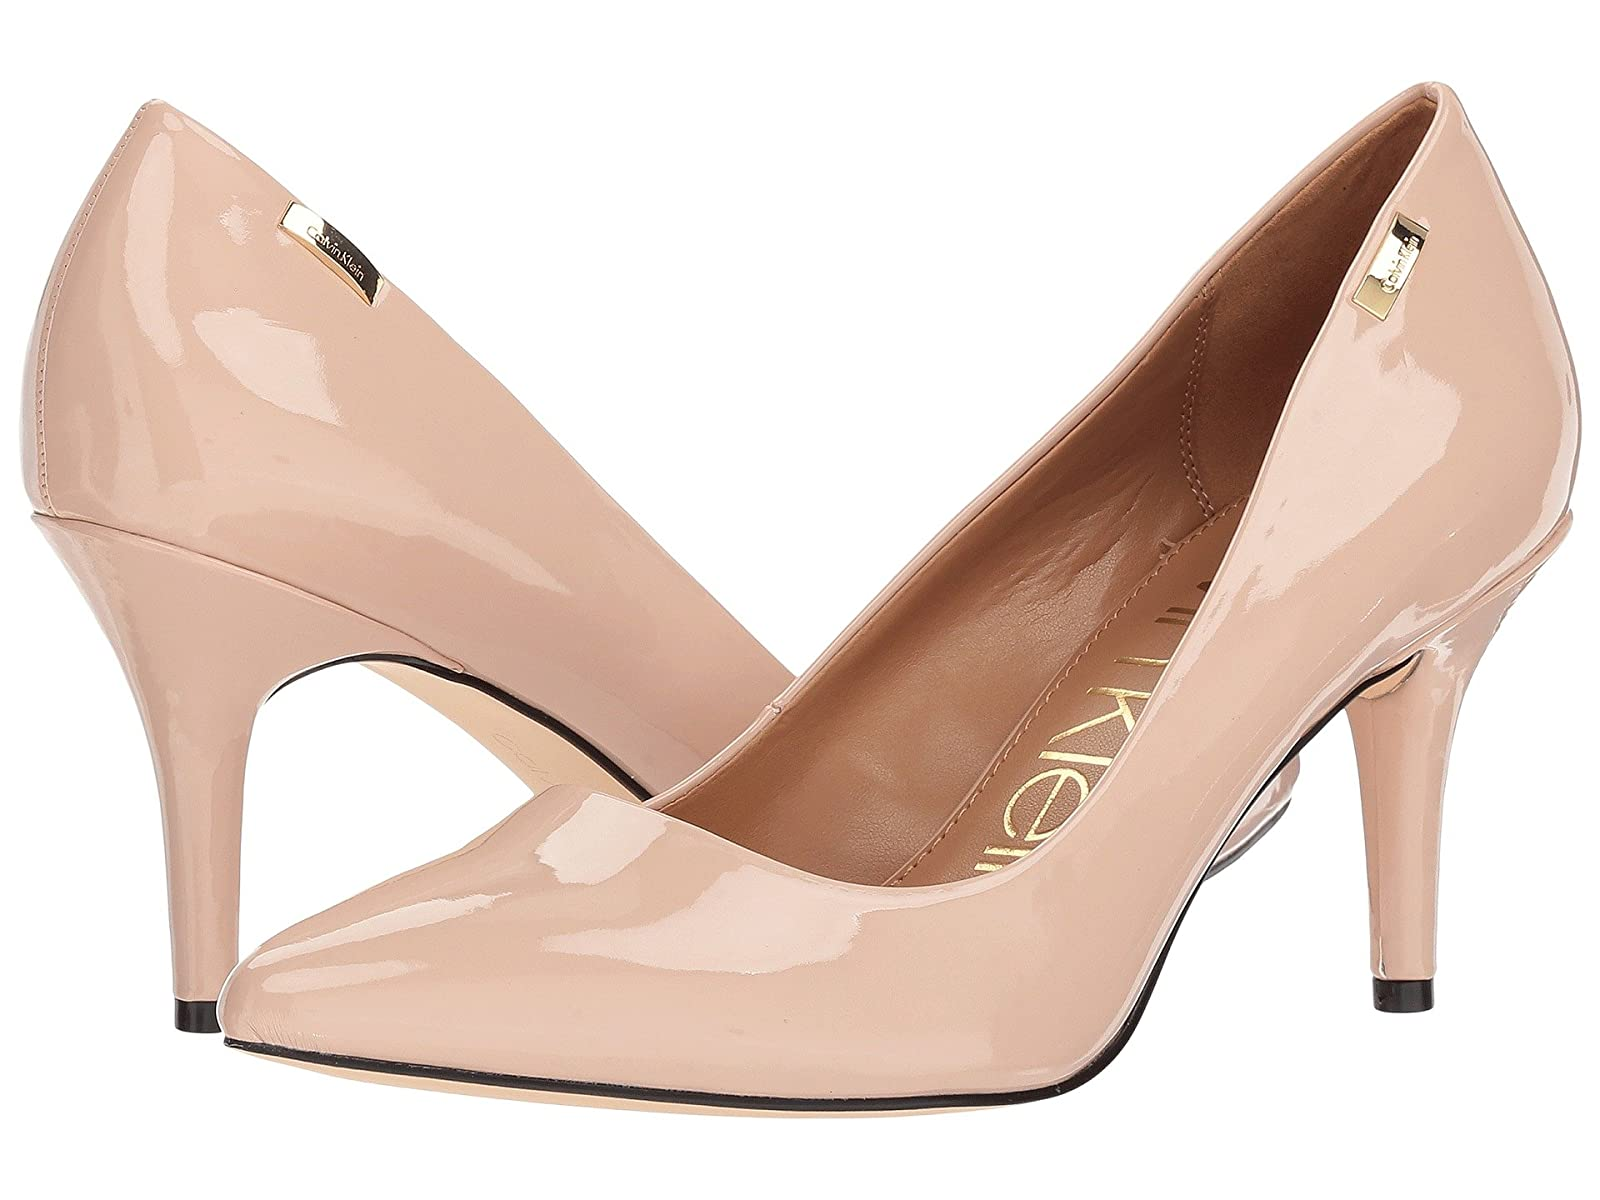 Calvin Klein KylieCheap and distinctive eye-catching shoes